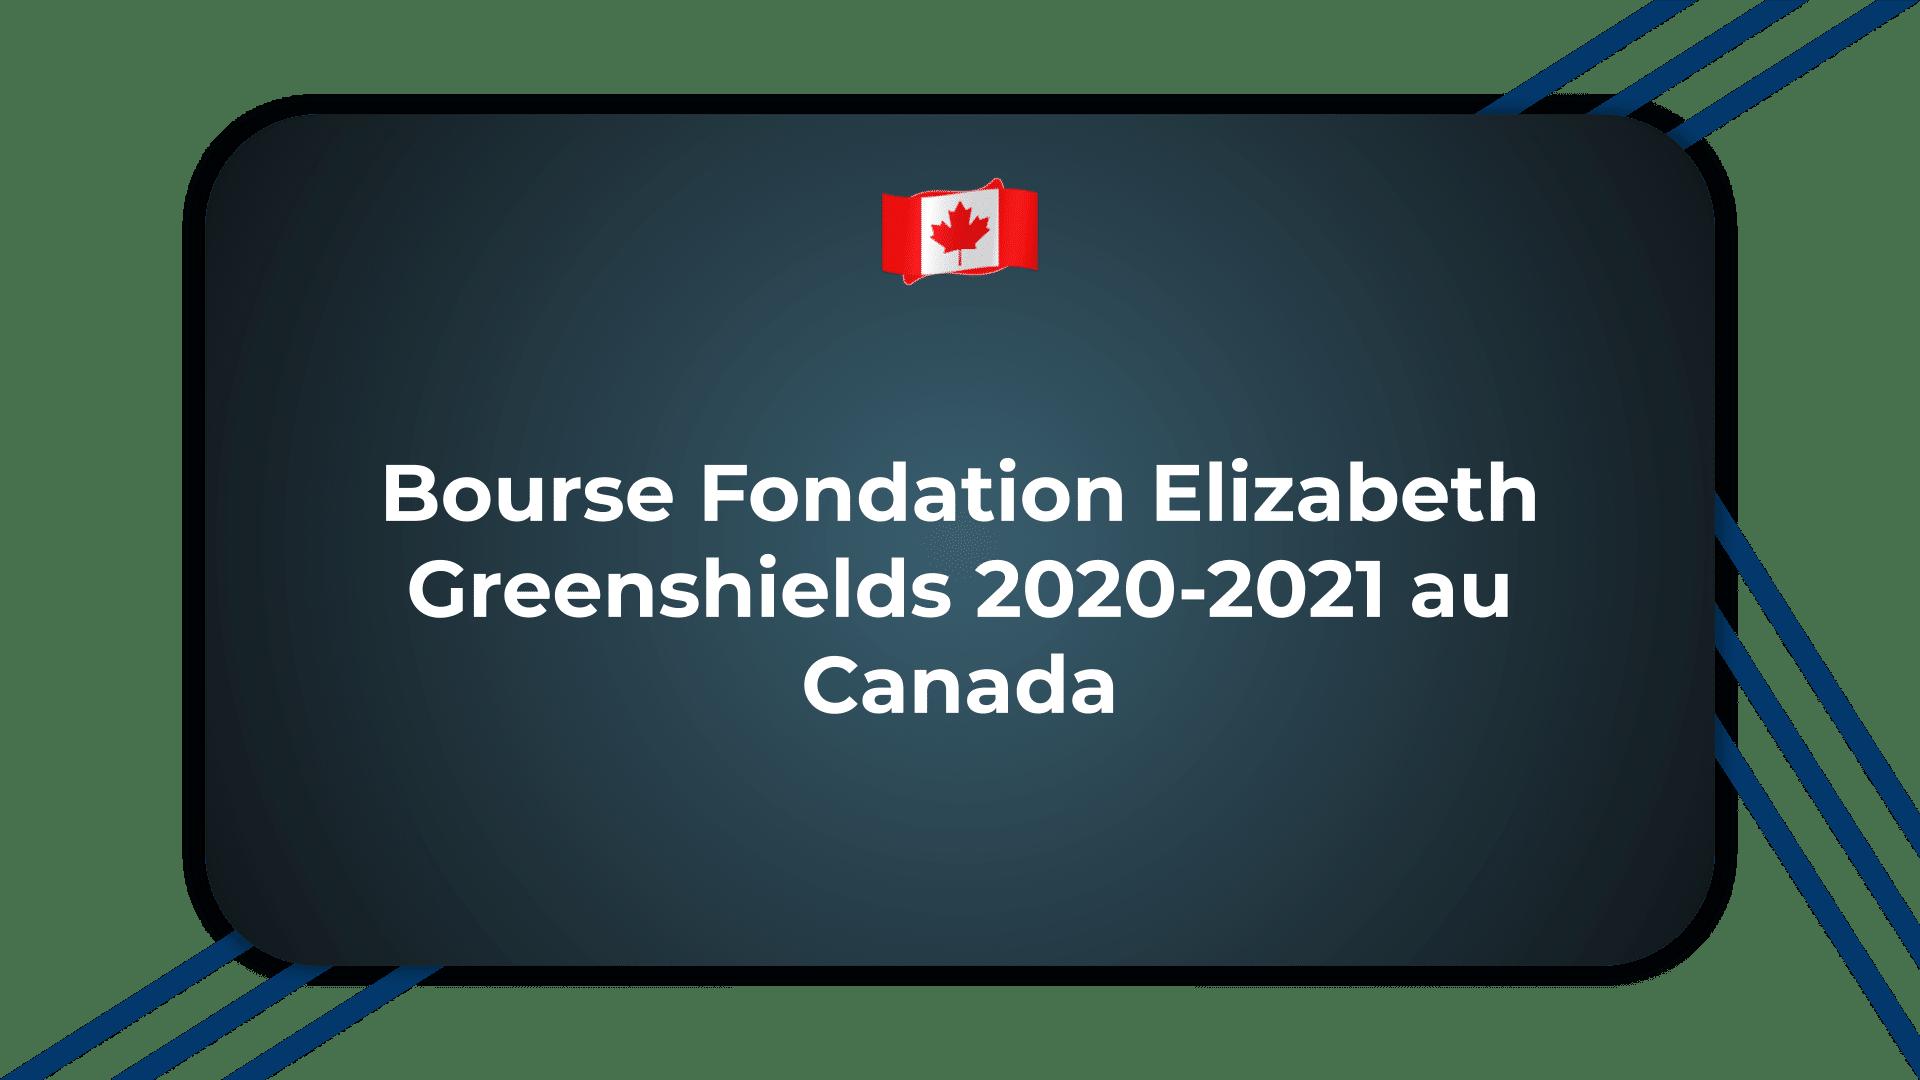 Bourse Fondation Elizabeth Greenshields